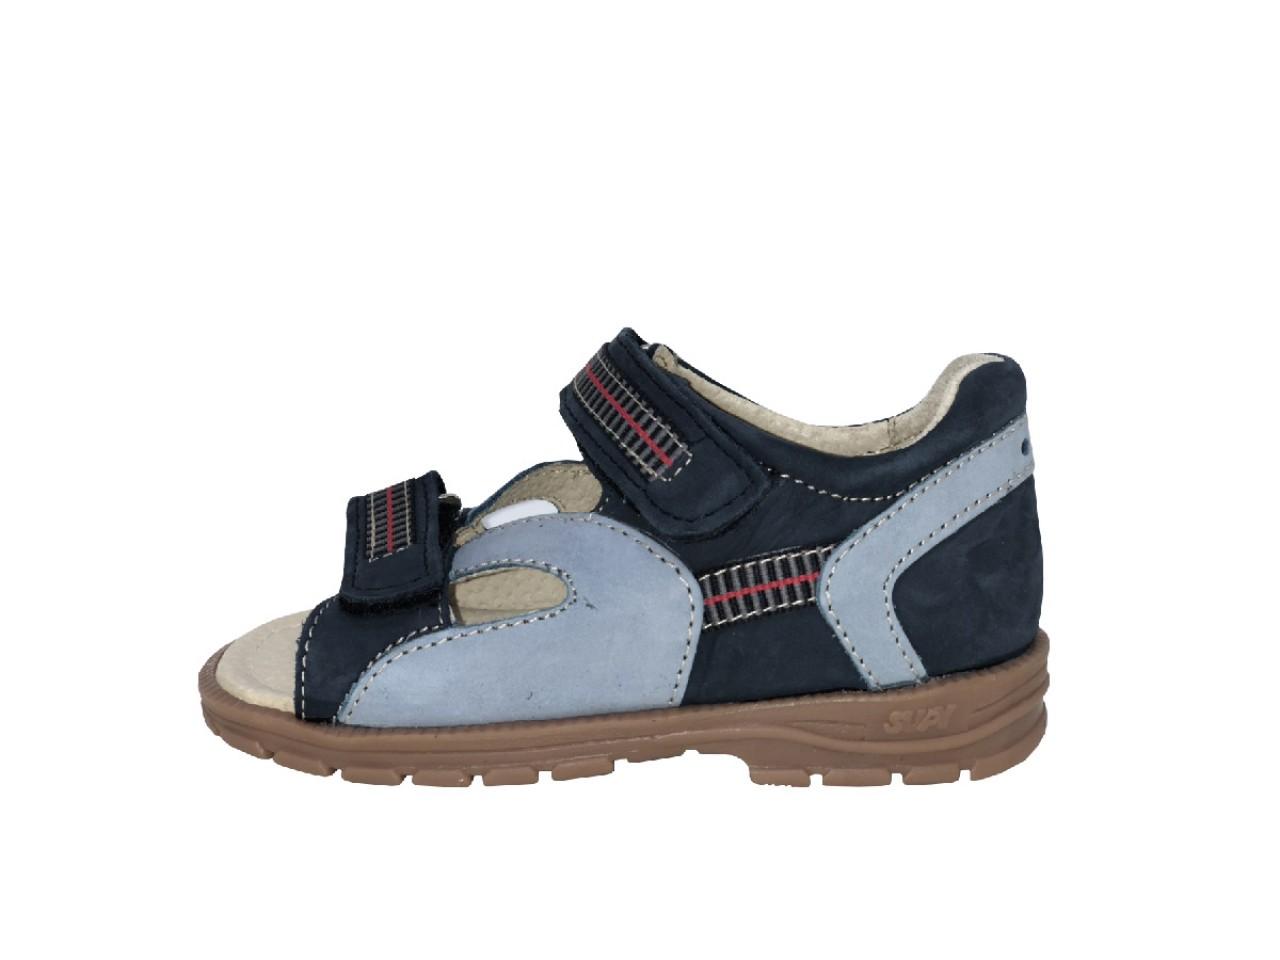 Supykids ROMI detské supinované sandále na suchý zips modré 23-32